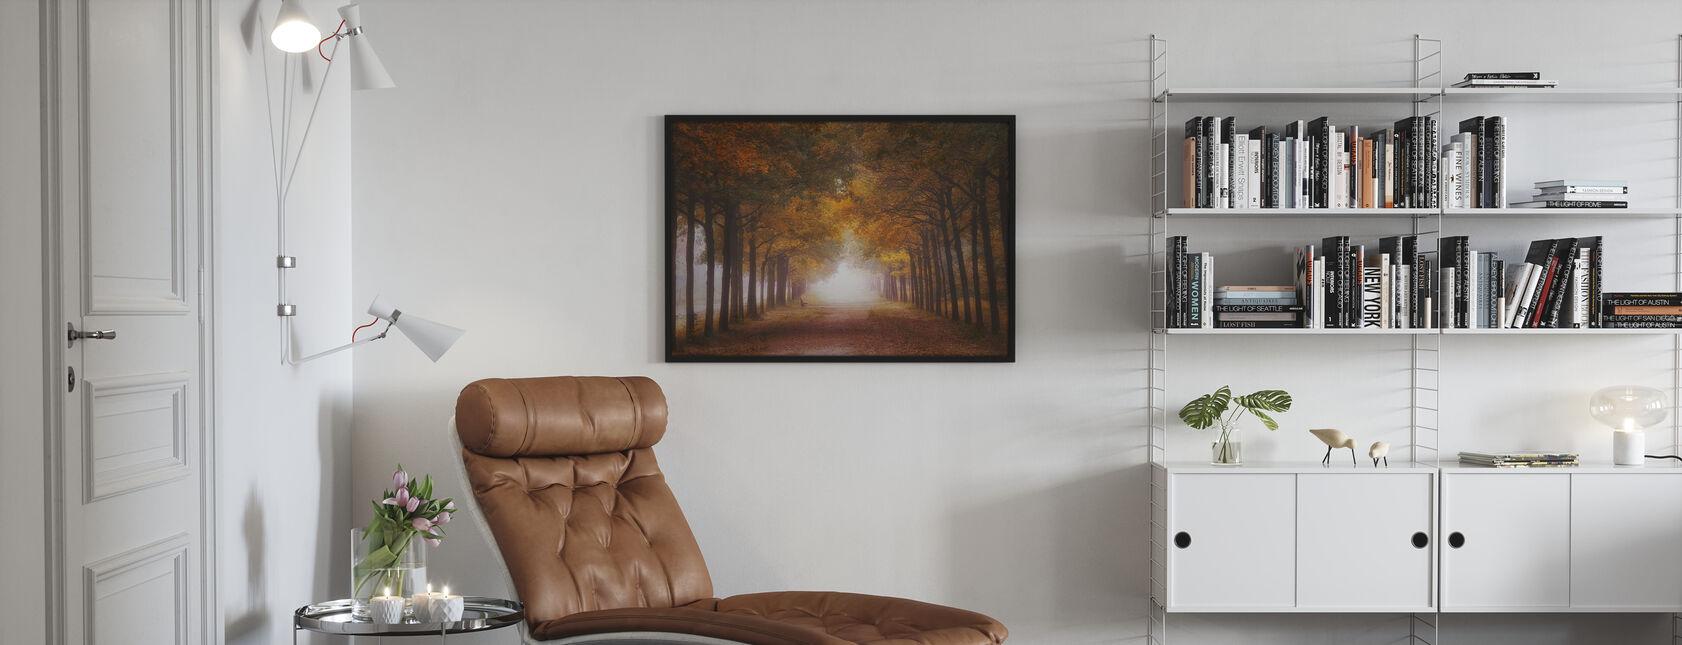 Foggy Autumn Dream - Poster - Living Room